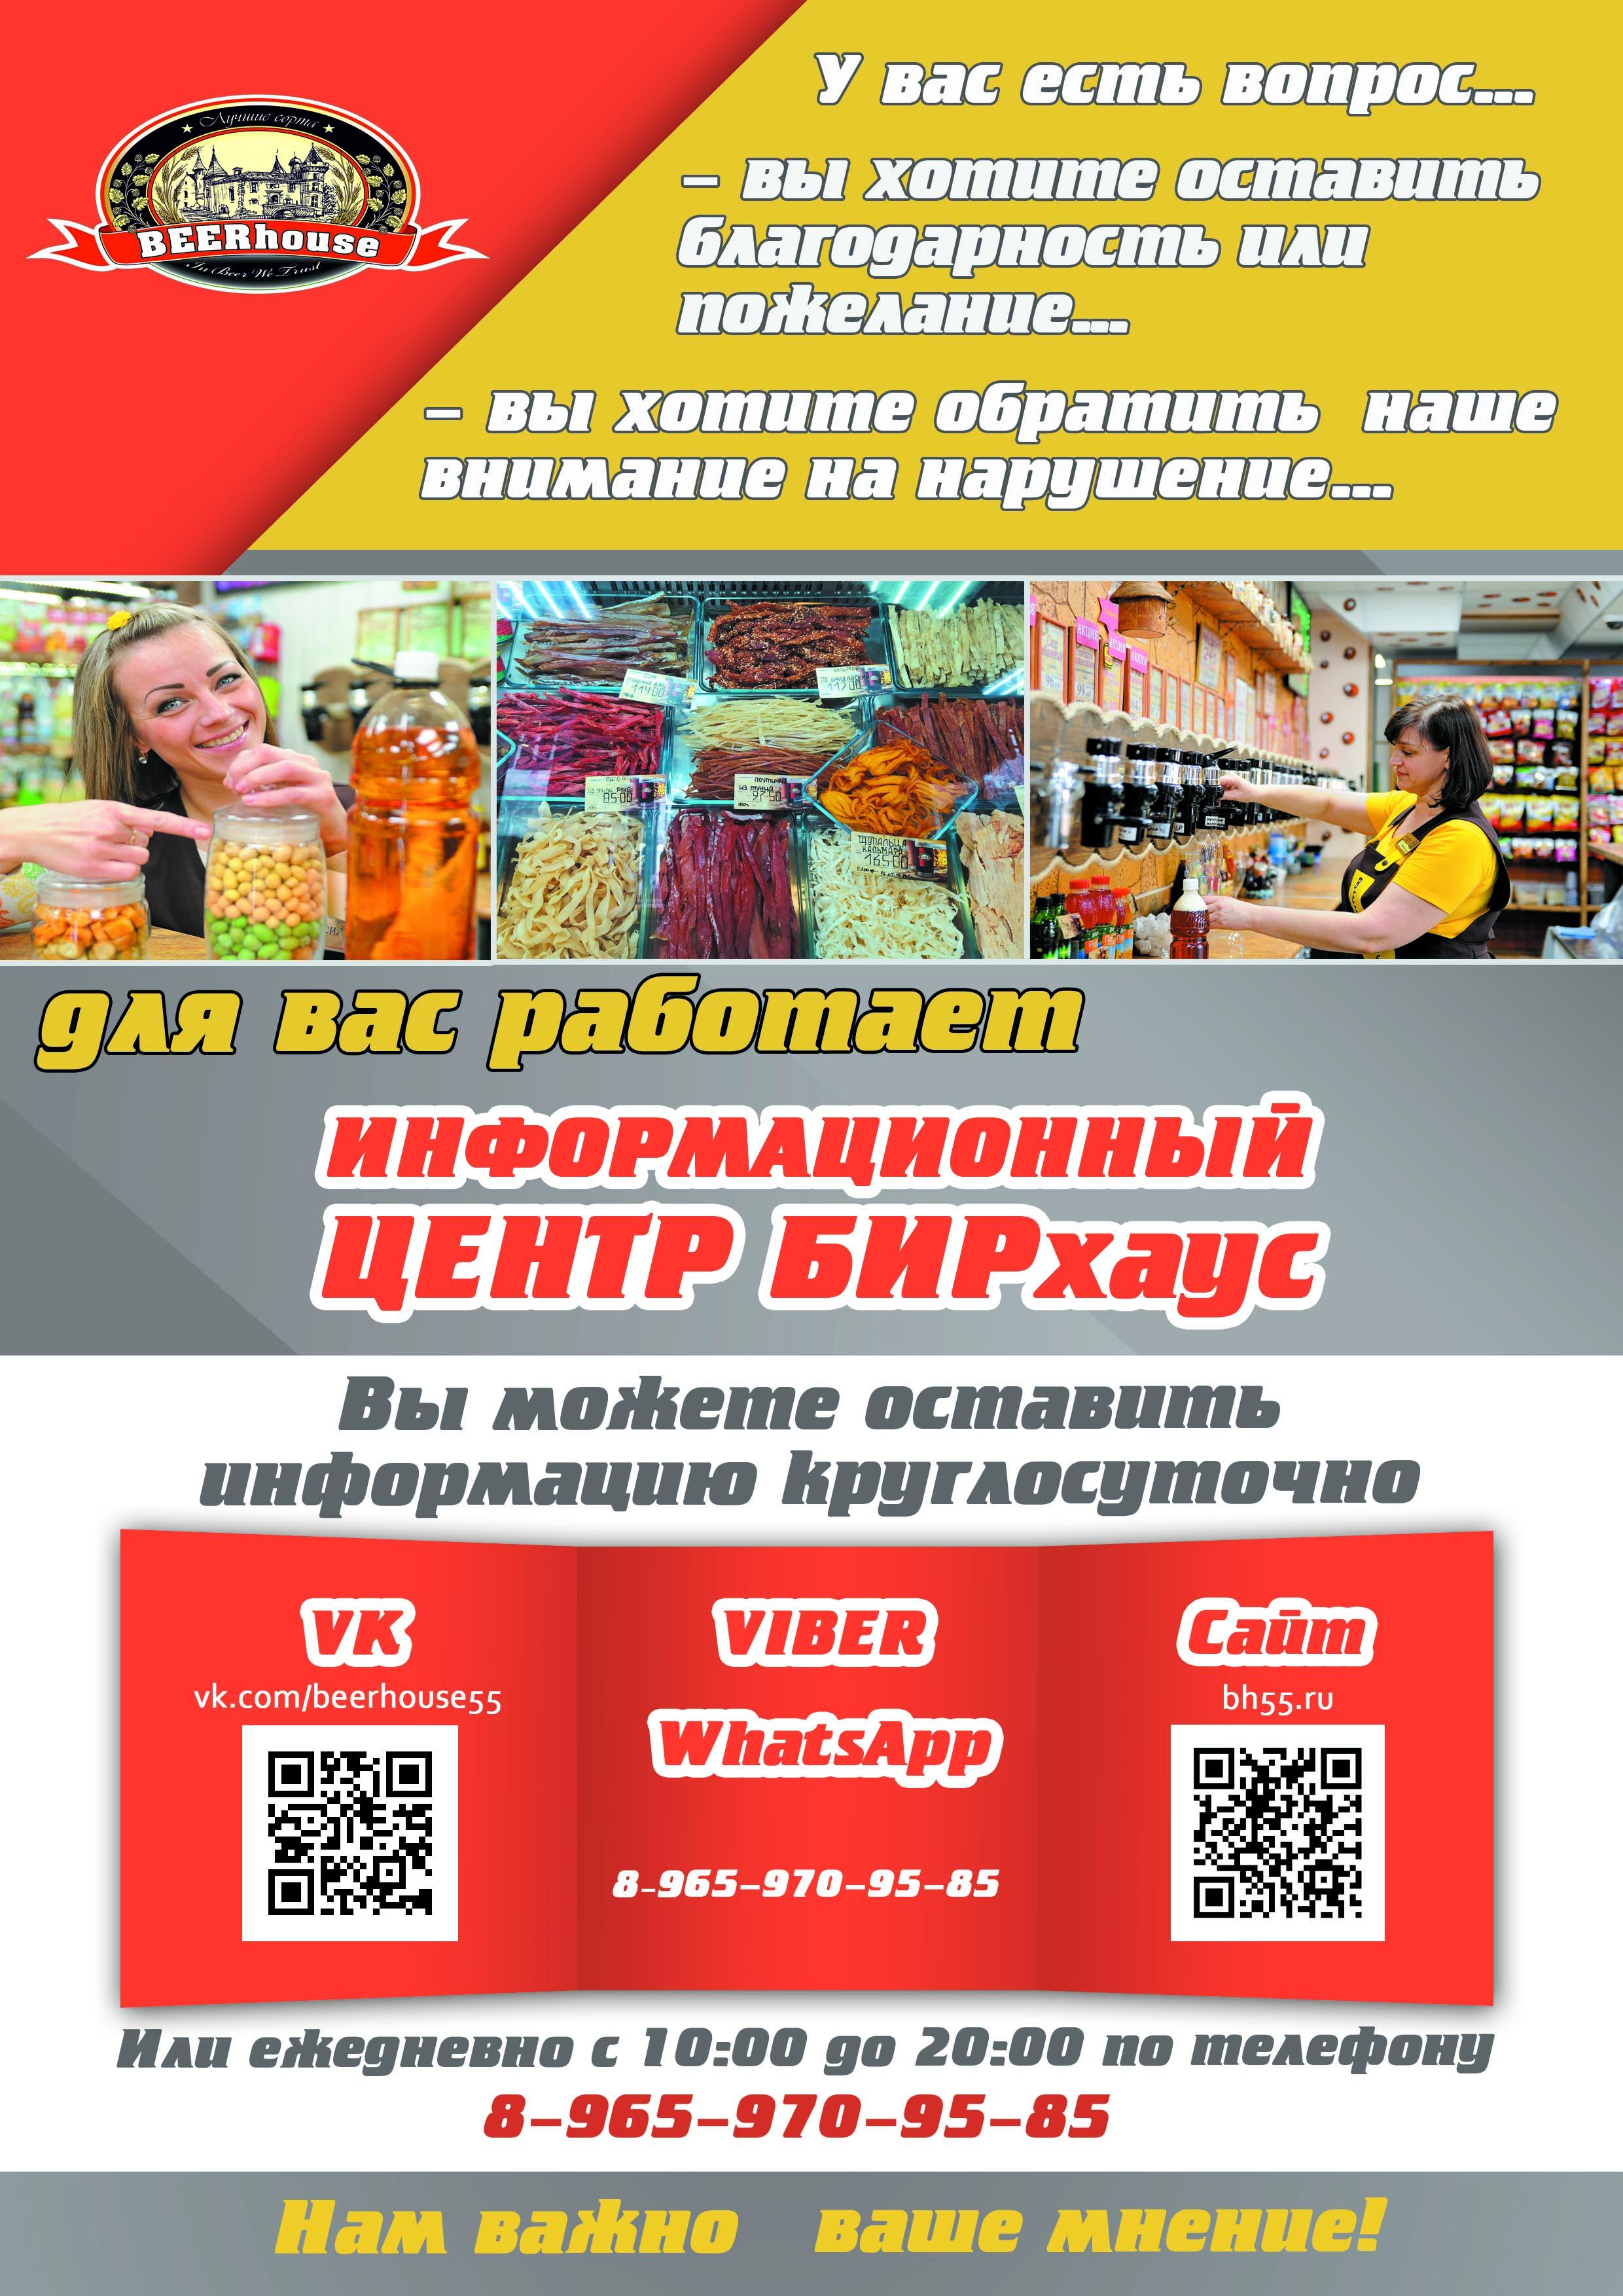 http://bh55.ru/wp-content/uploads/2020/07/26.jpg